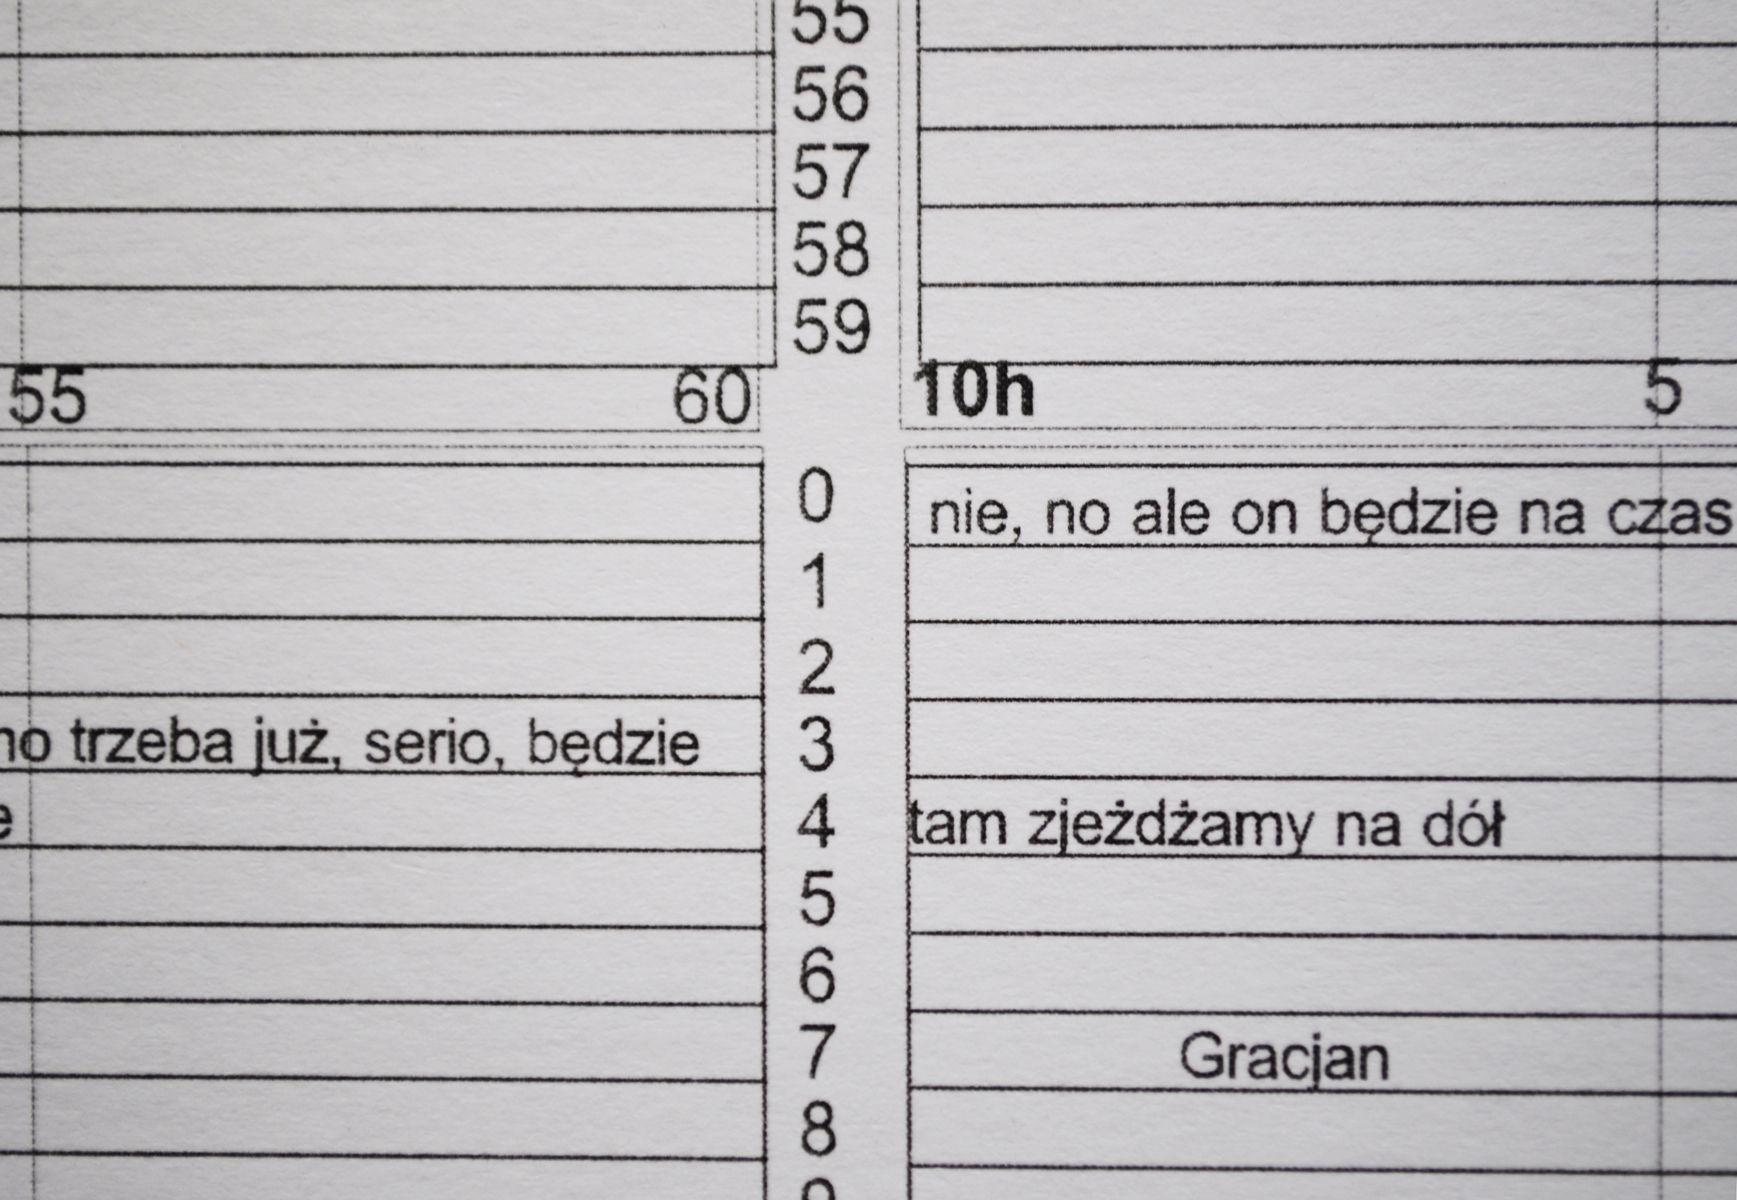 Michał Soja, 24/7, Henryk, fot.Michał Soja